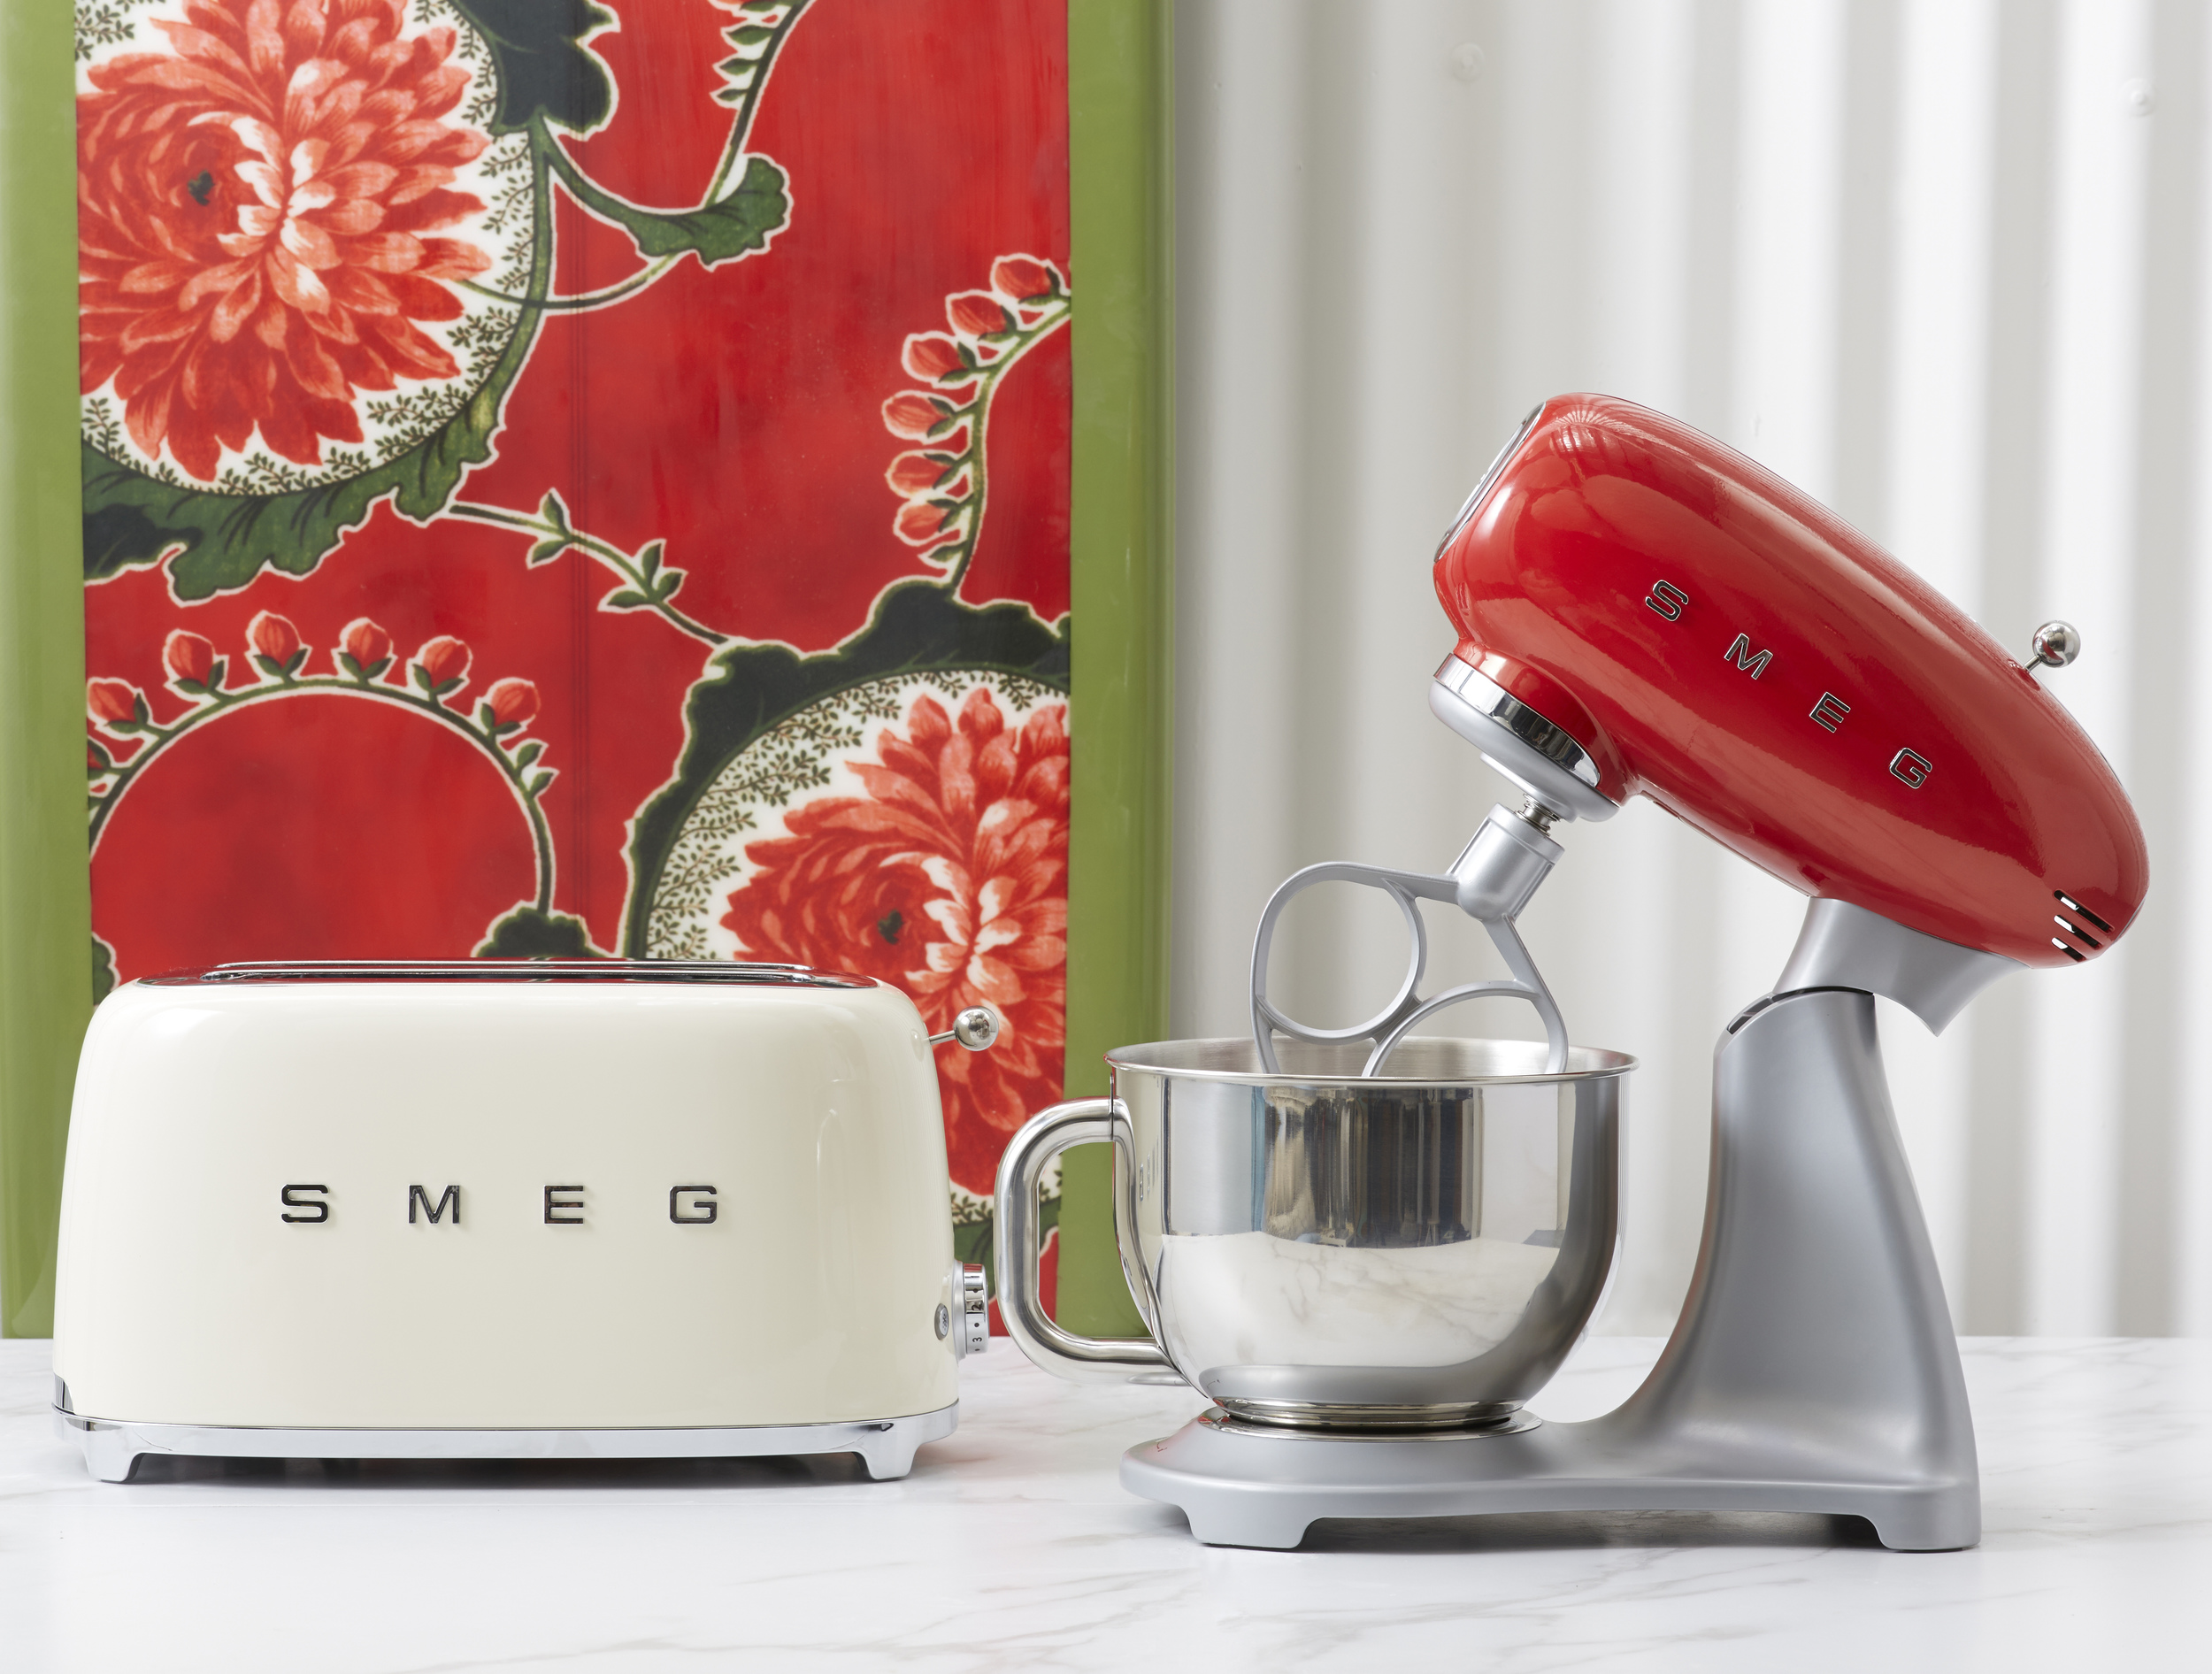 Vive-Cooking-School-Smeg-toaster-blender.jpg